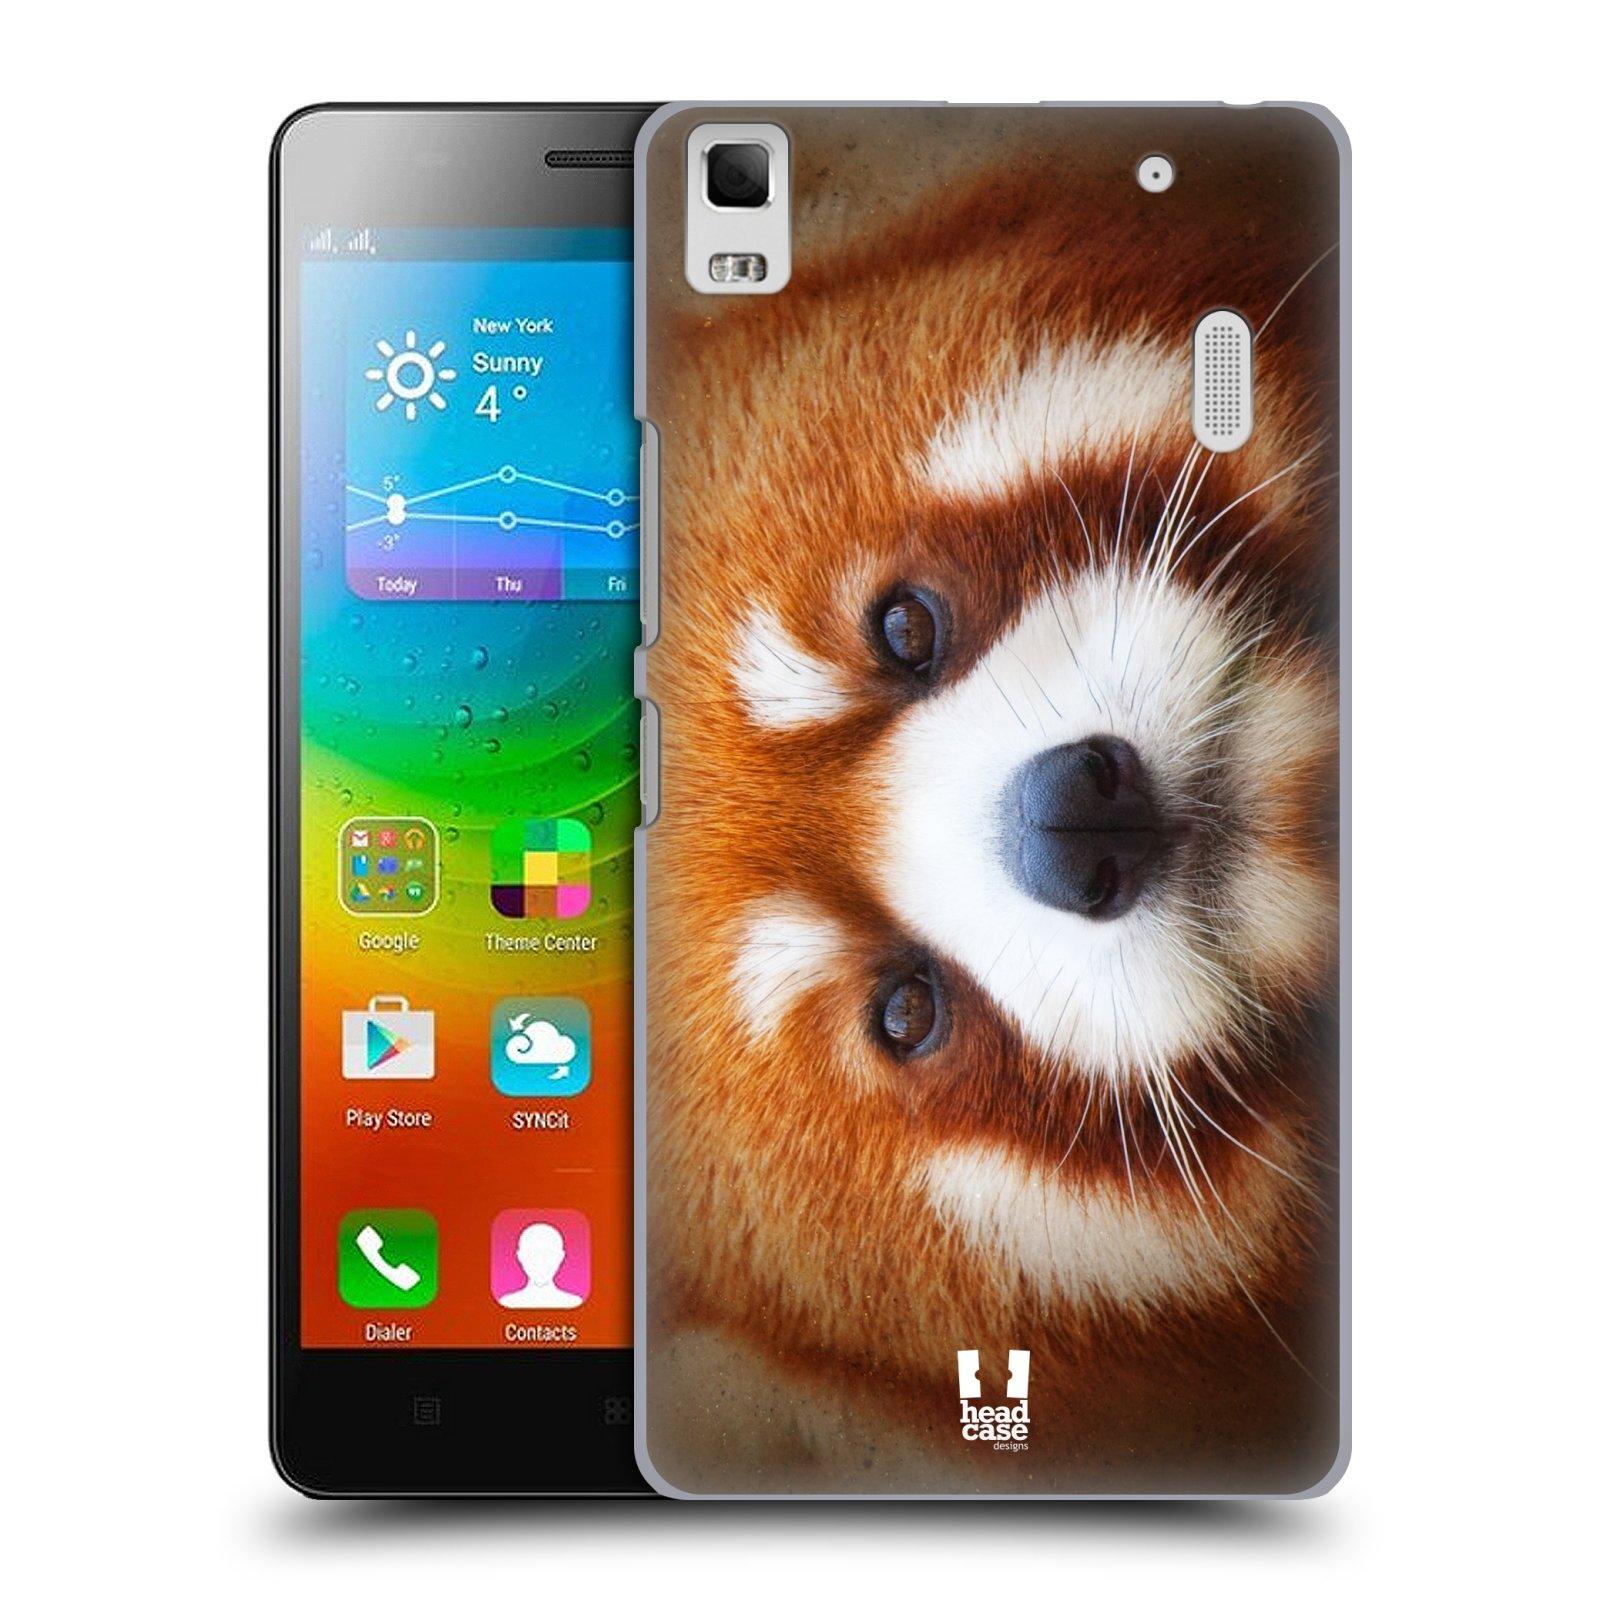 HEAD CASE pevný plastový obal na mobil LENOVO A7000 / A7000 DUAL / K3 NOTE vzor Zvířecí tváře 2 medvěd panda rudá